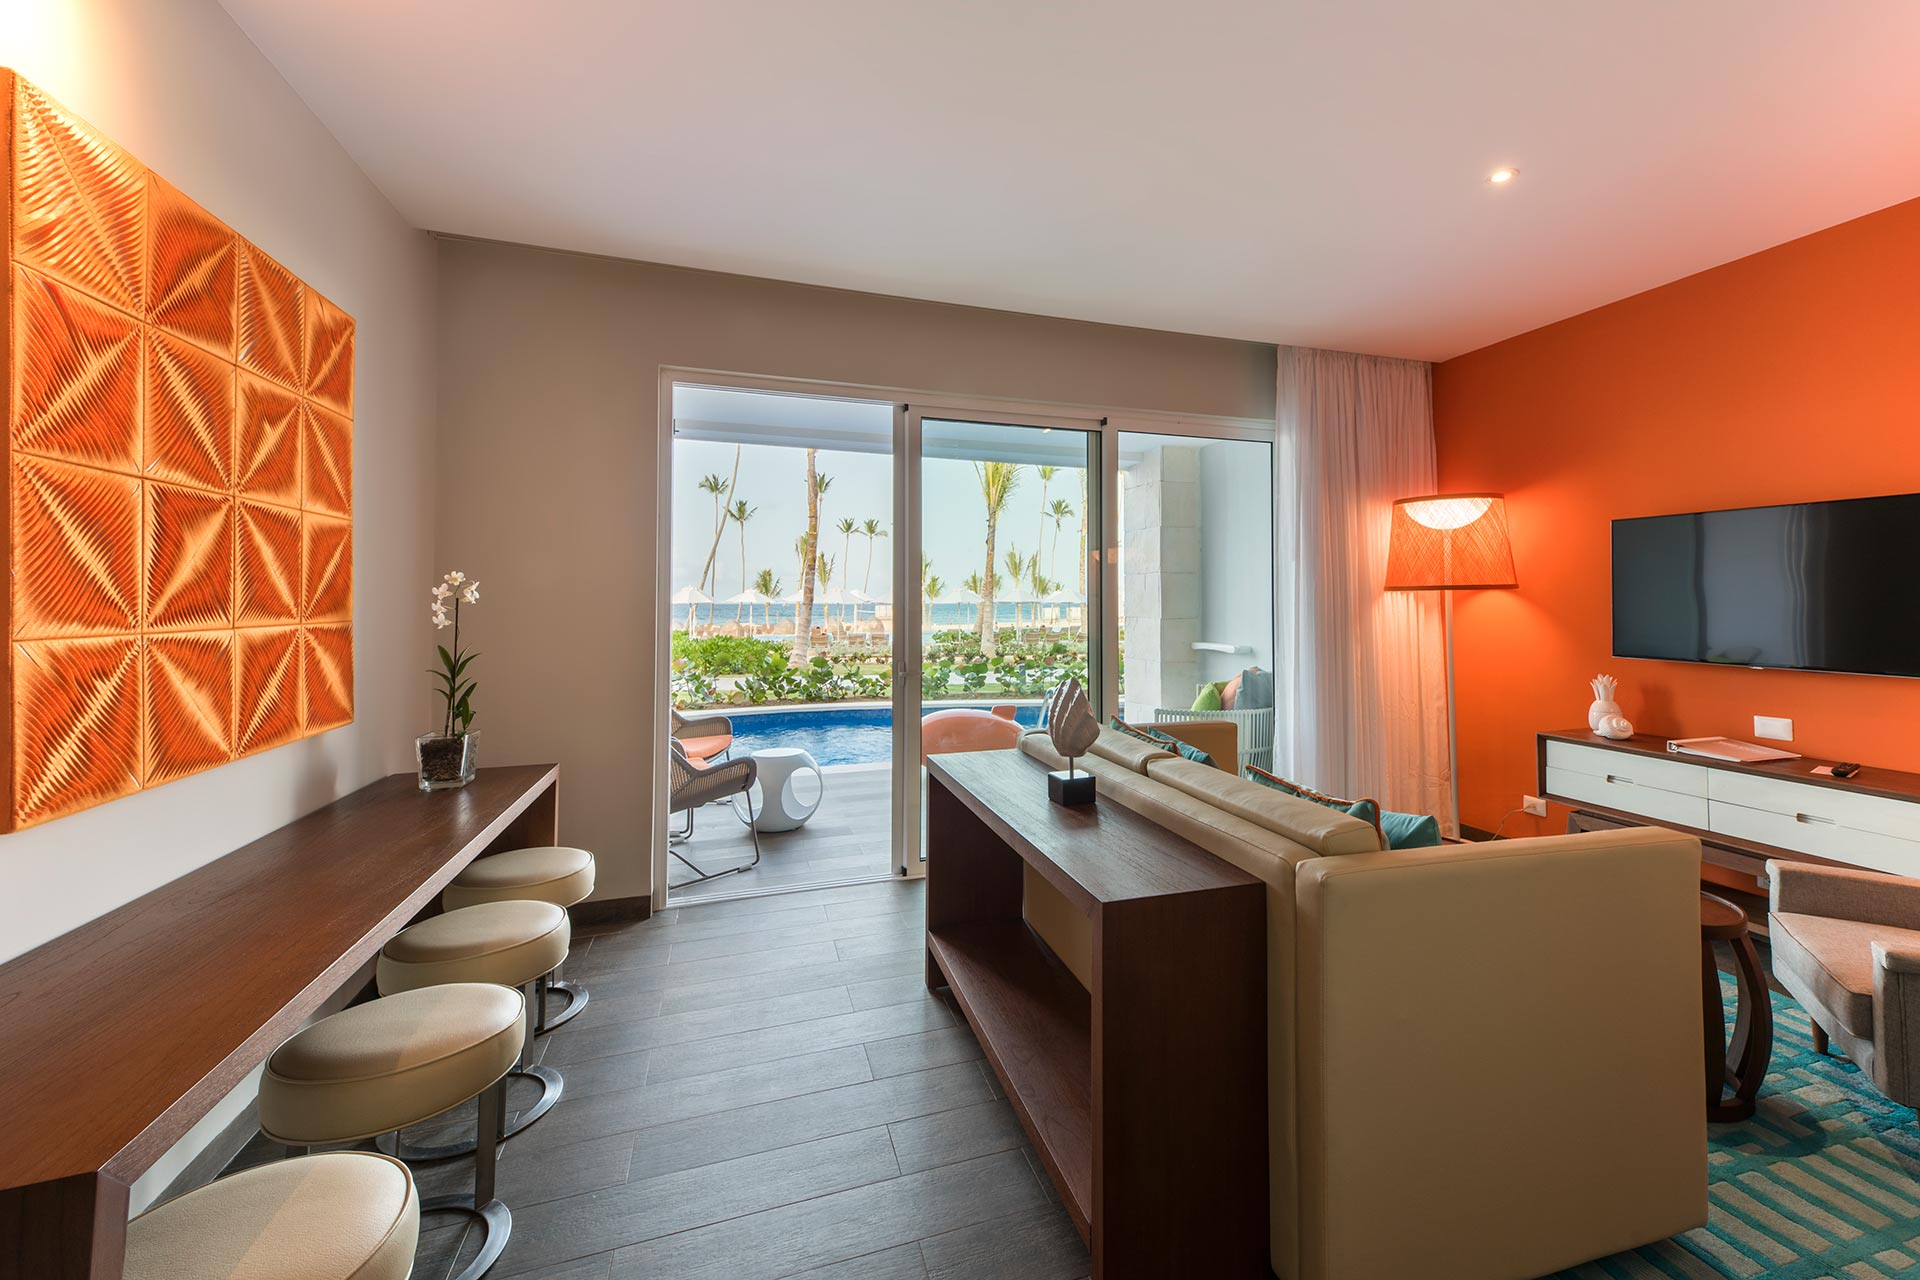 Swim-up suite at Nickelodeon Hotels and Resorts Punta Cana.